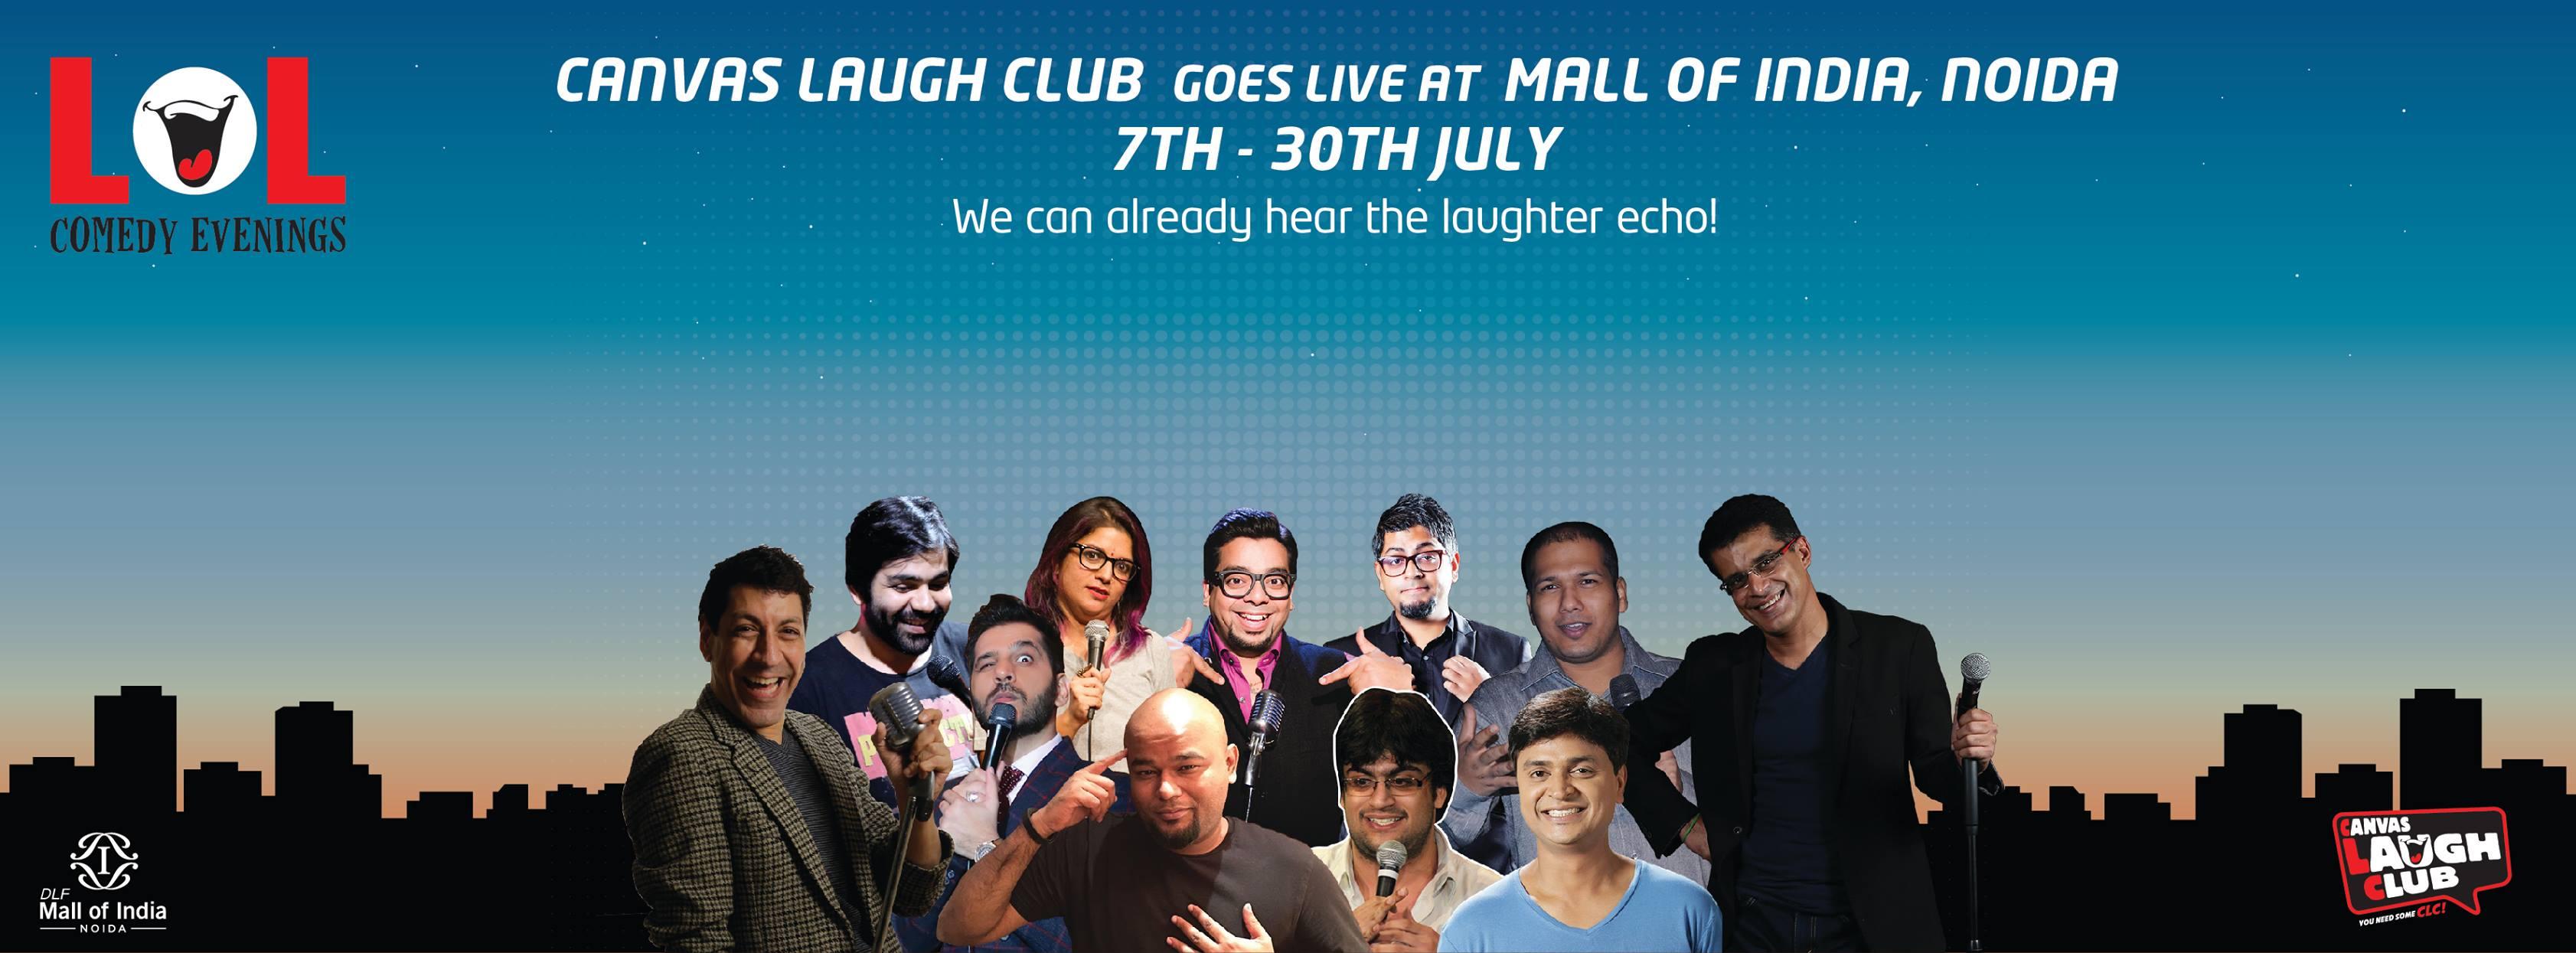 Canvas Laugh Club lol Evenings Noida